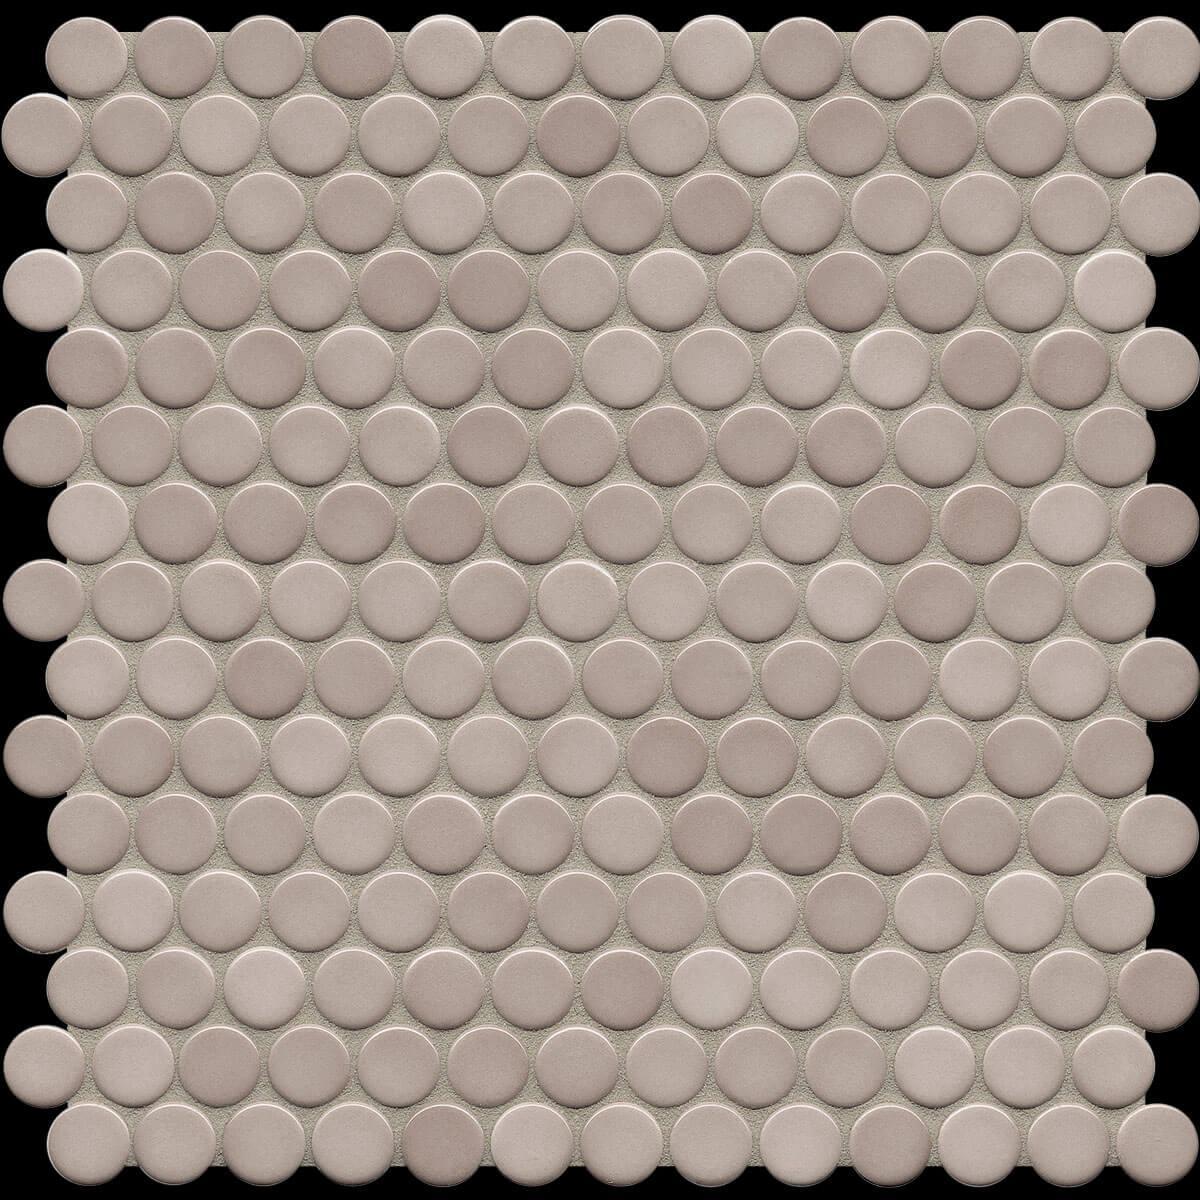 Agrob Buchtal Tiles - KLAY_Loop-_0018_40023H